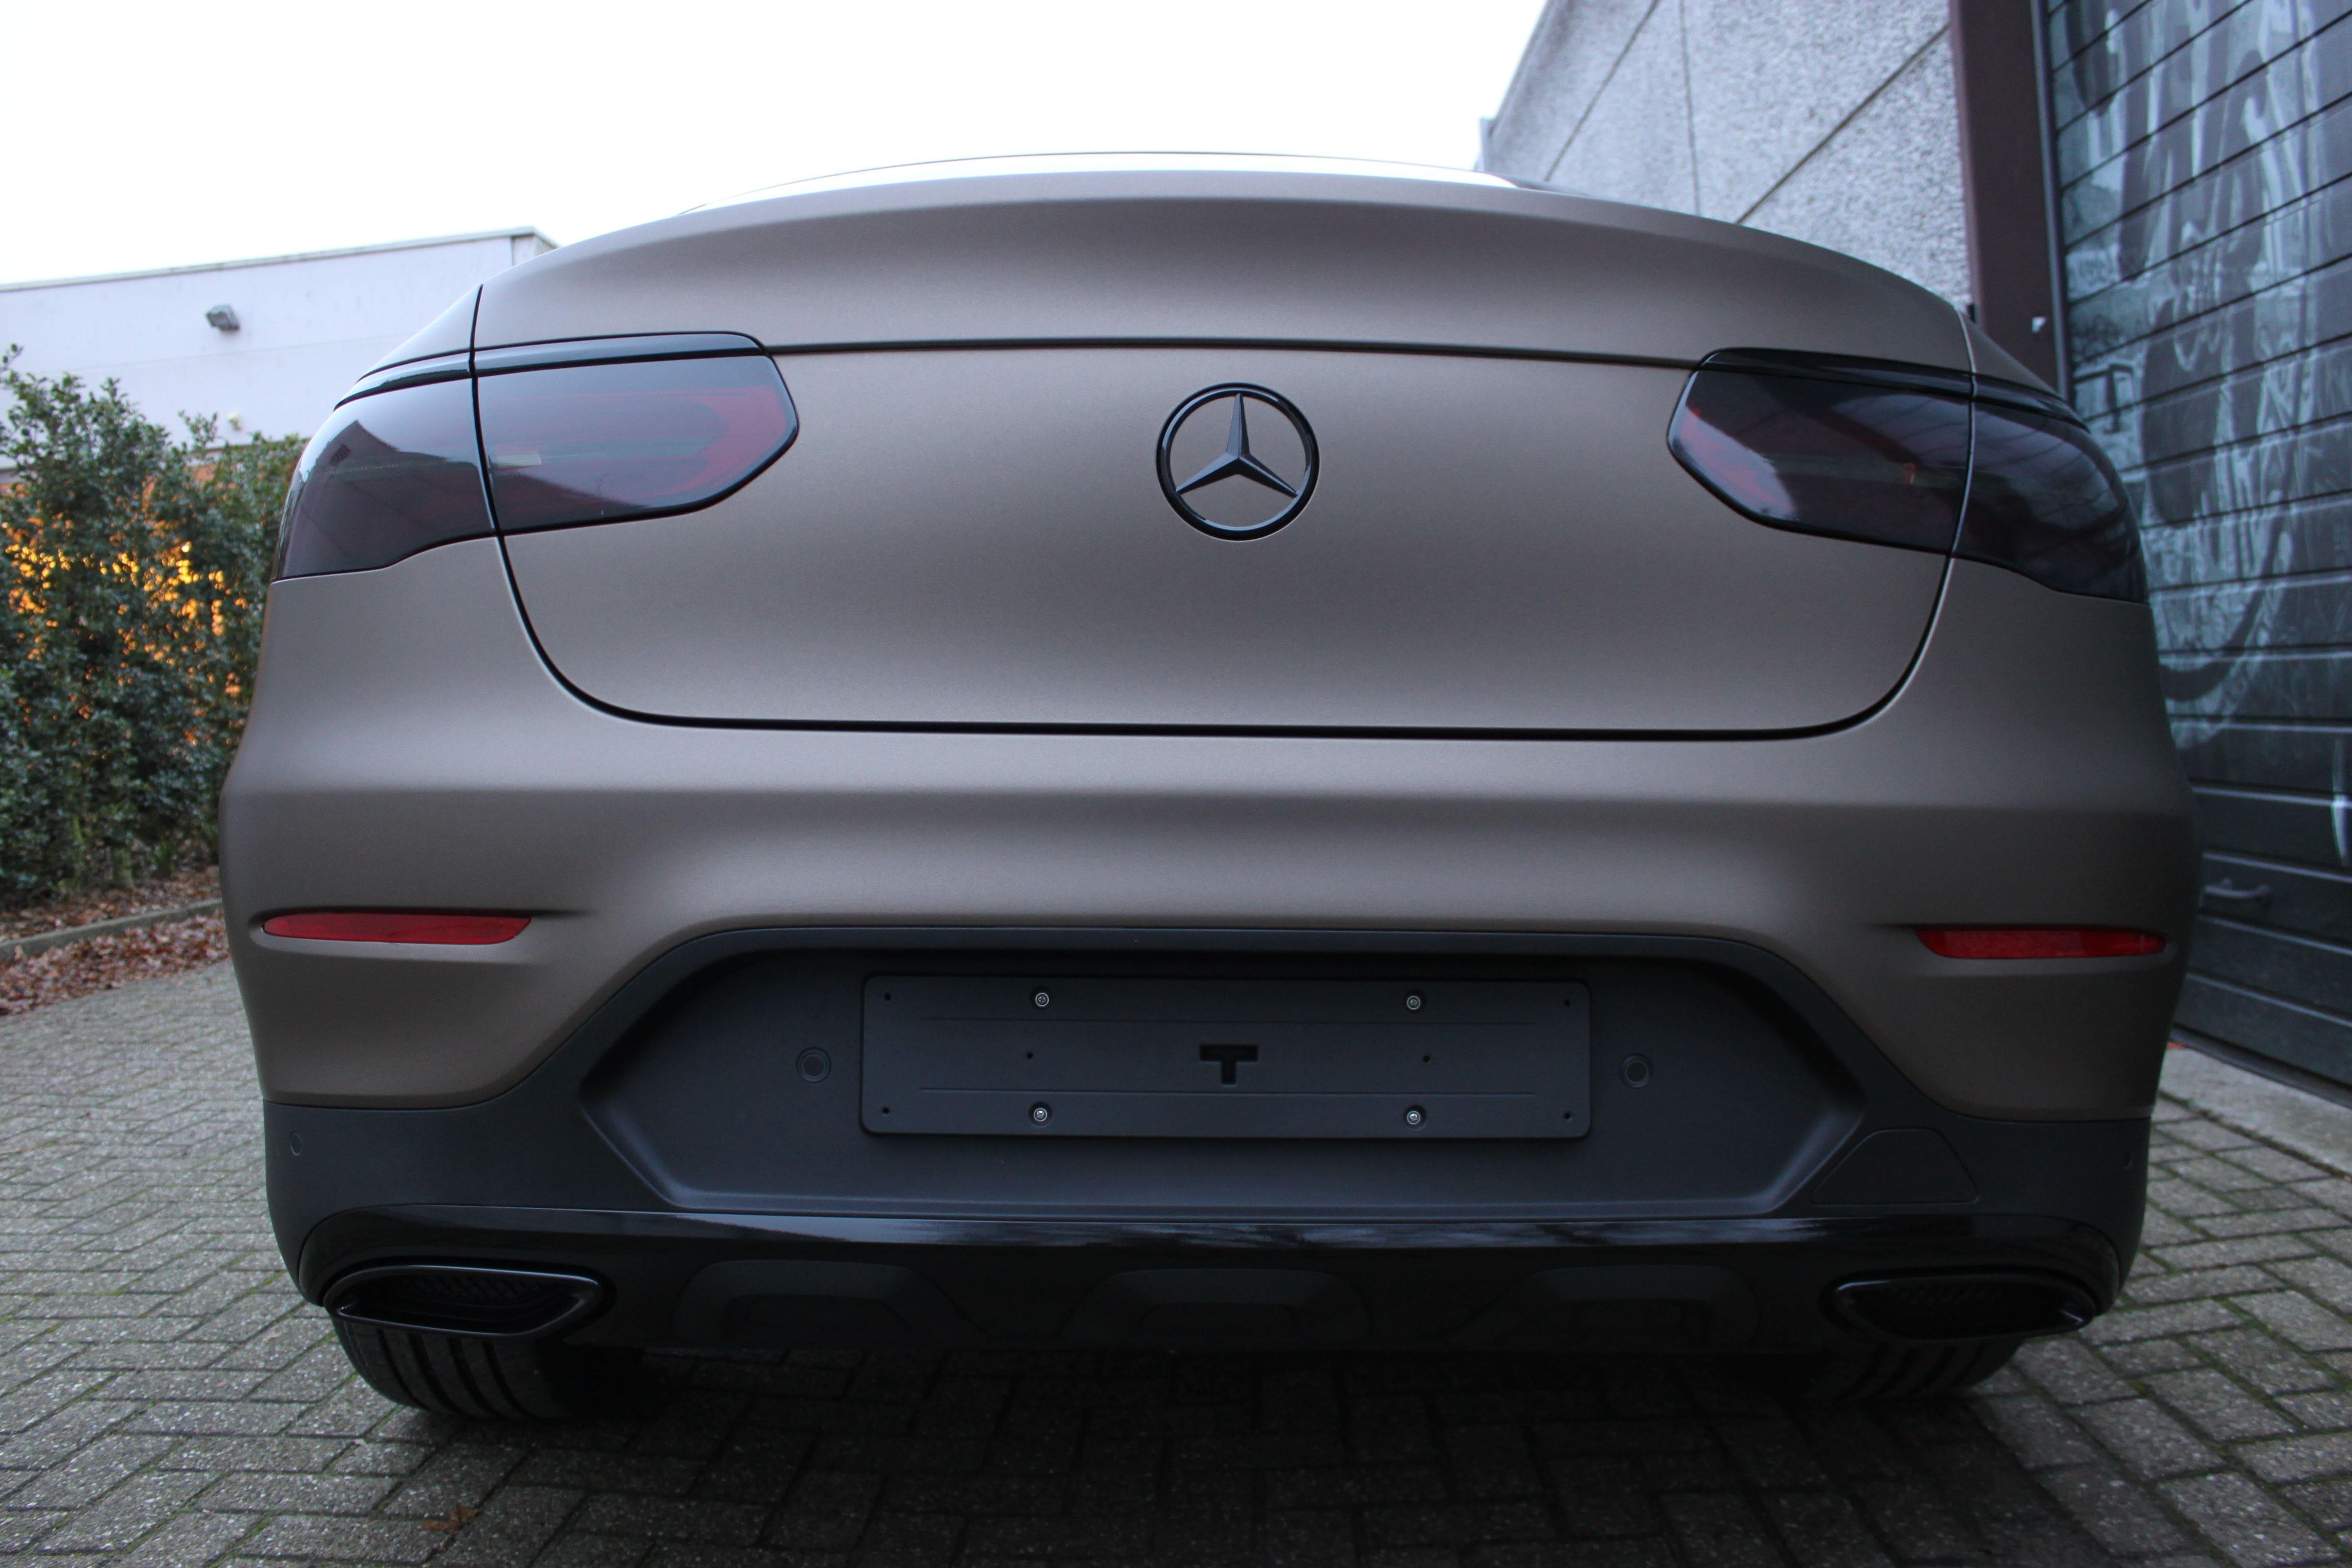 Mercedes GLC Coupe Matte metallic brown, Carwrapping door Wrapmyride.nu Foto-nr:9353, ©2021